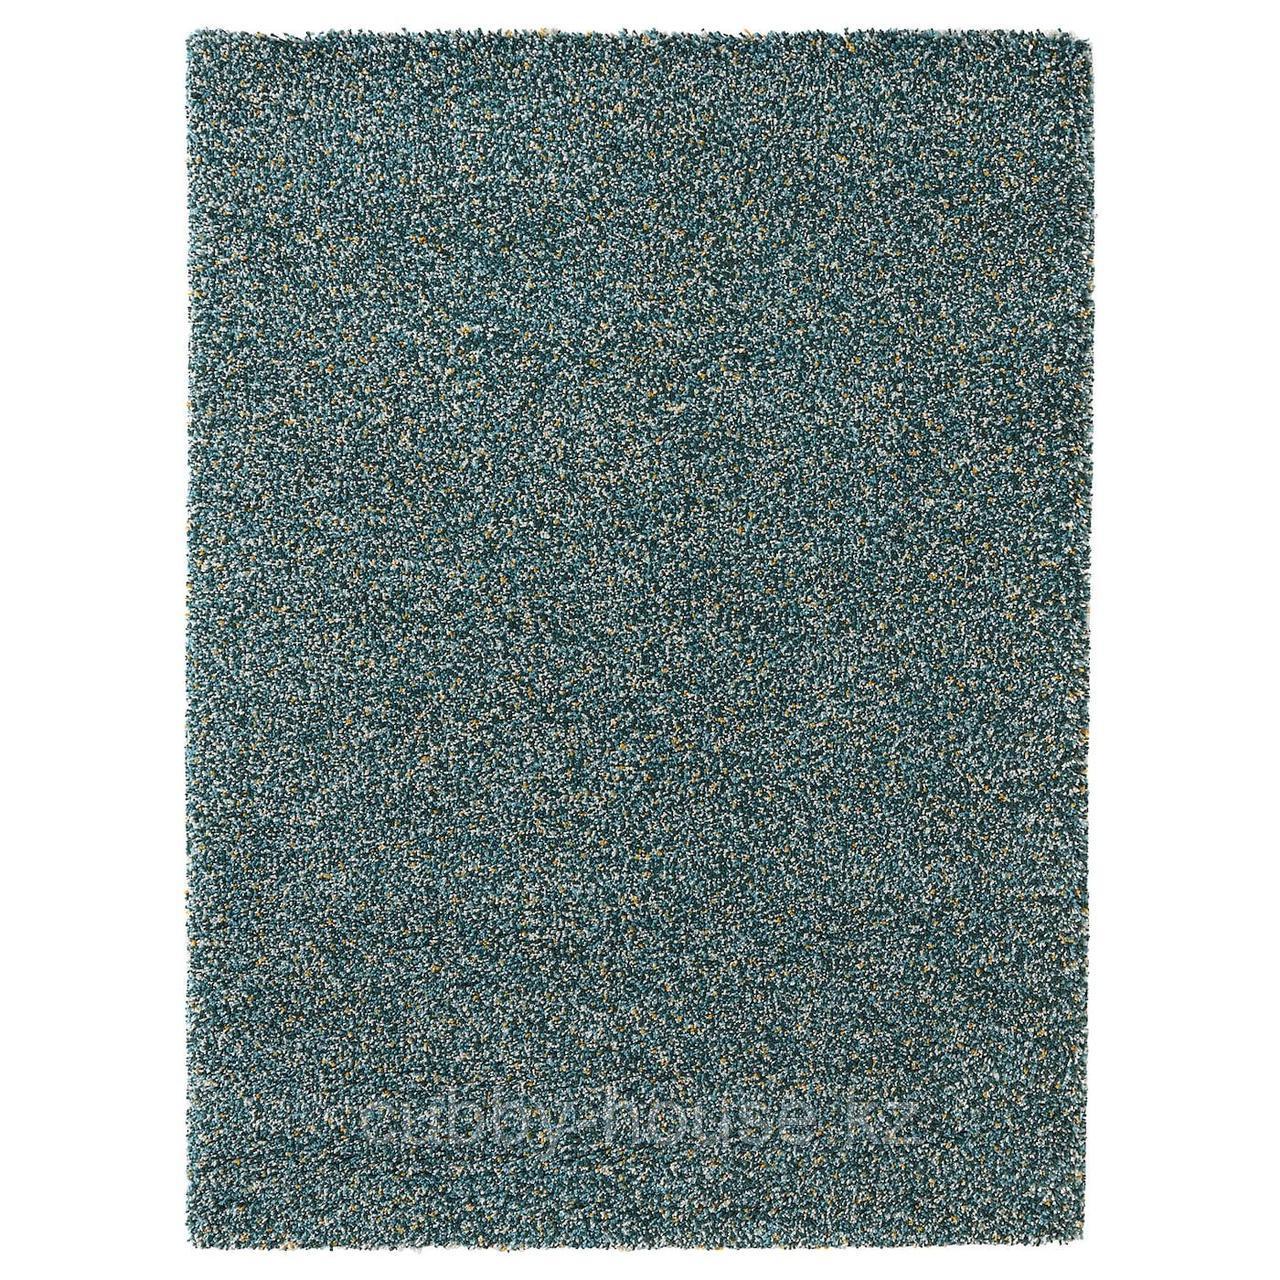 ВИНДУМ Ковер, длинный ворс, сине-зеленый синий, 170x230 см